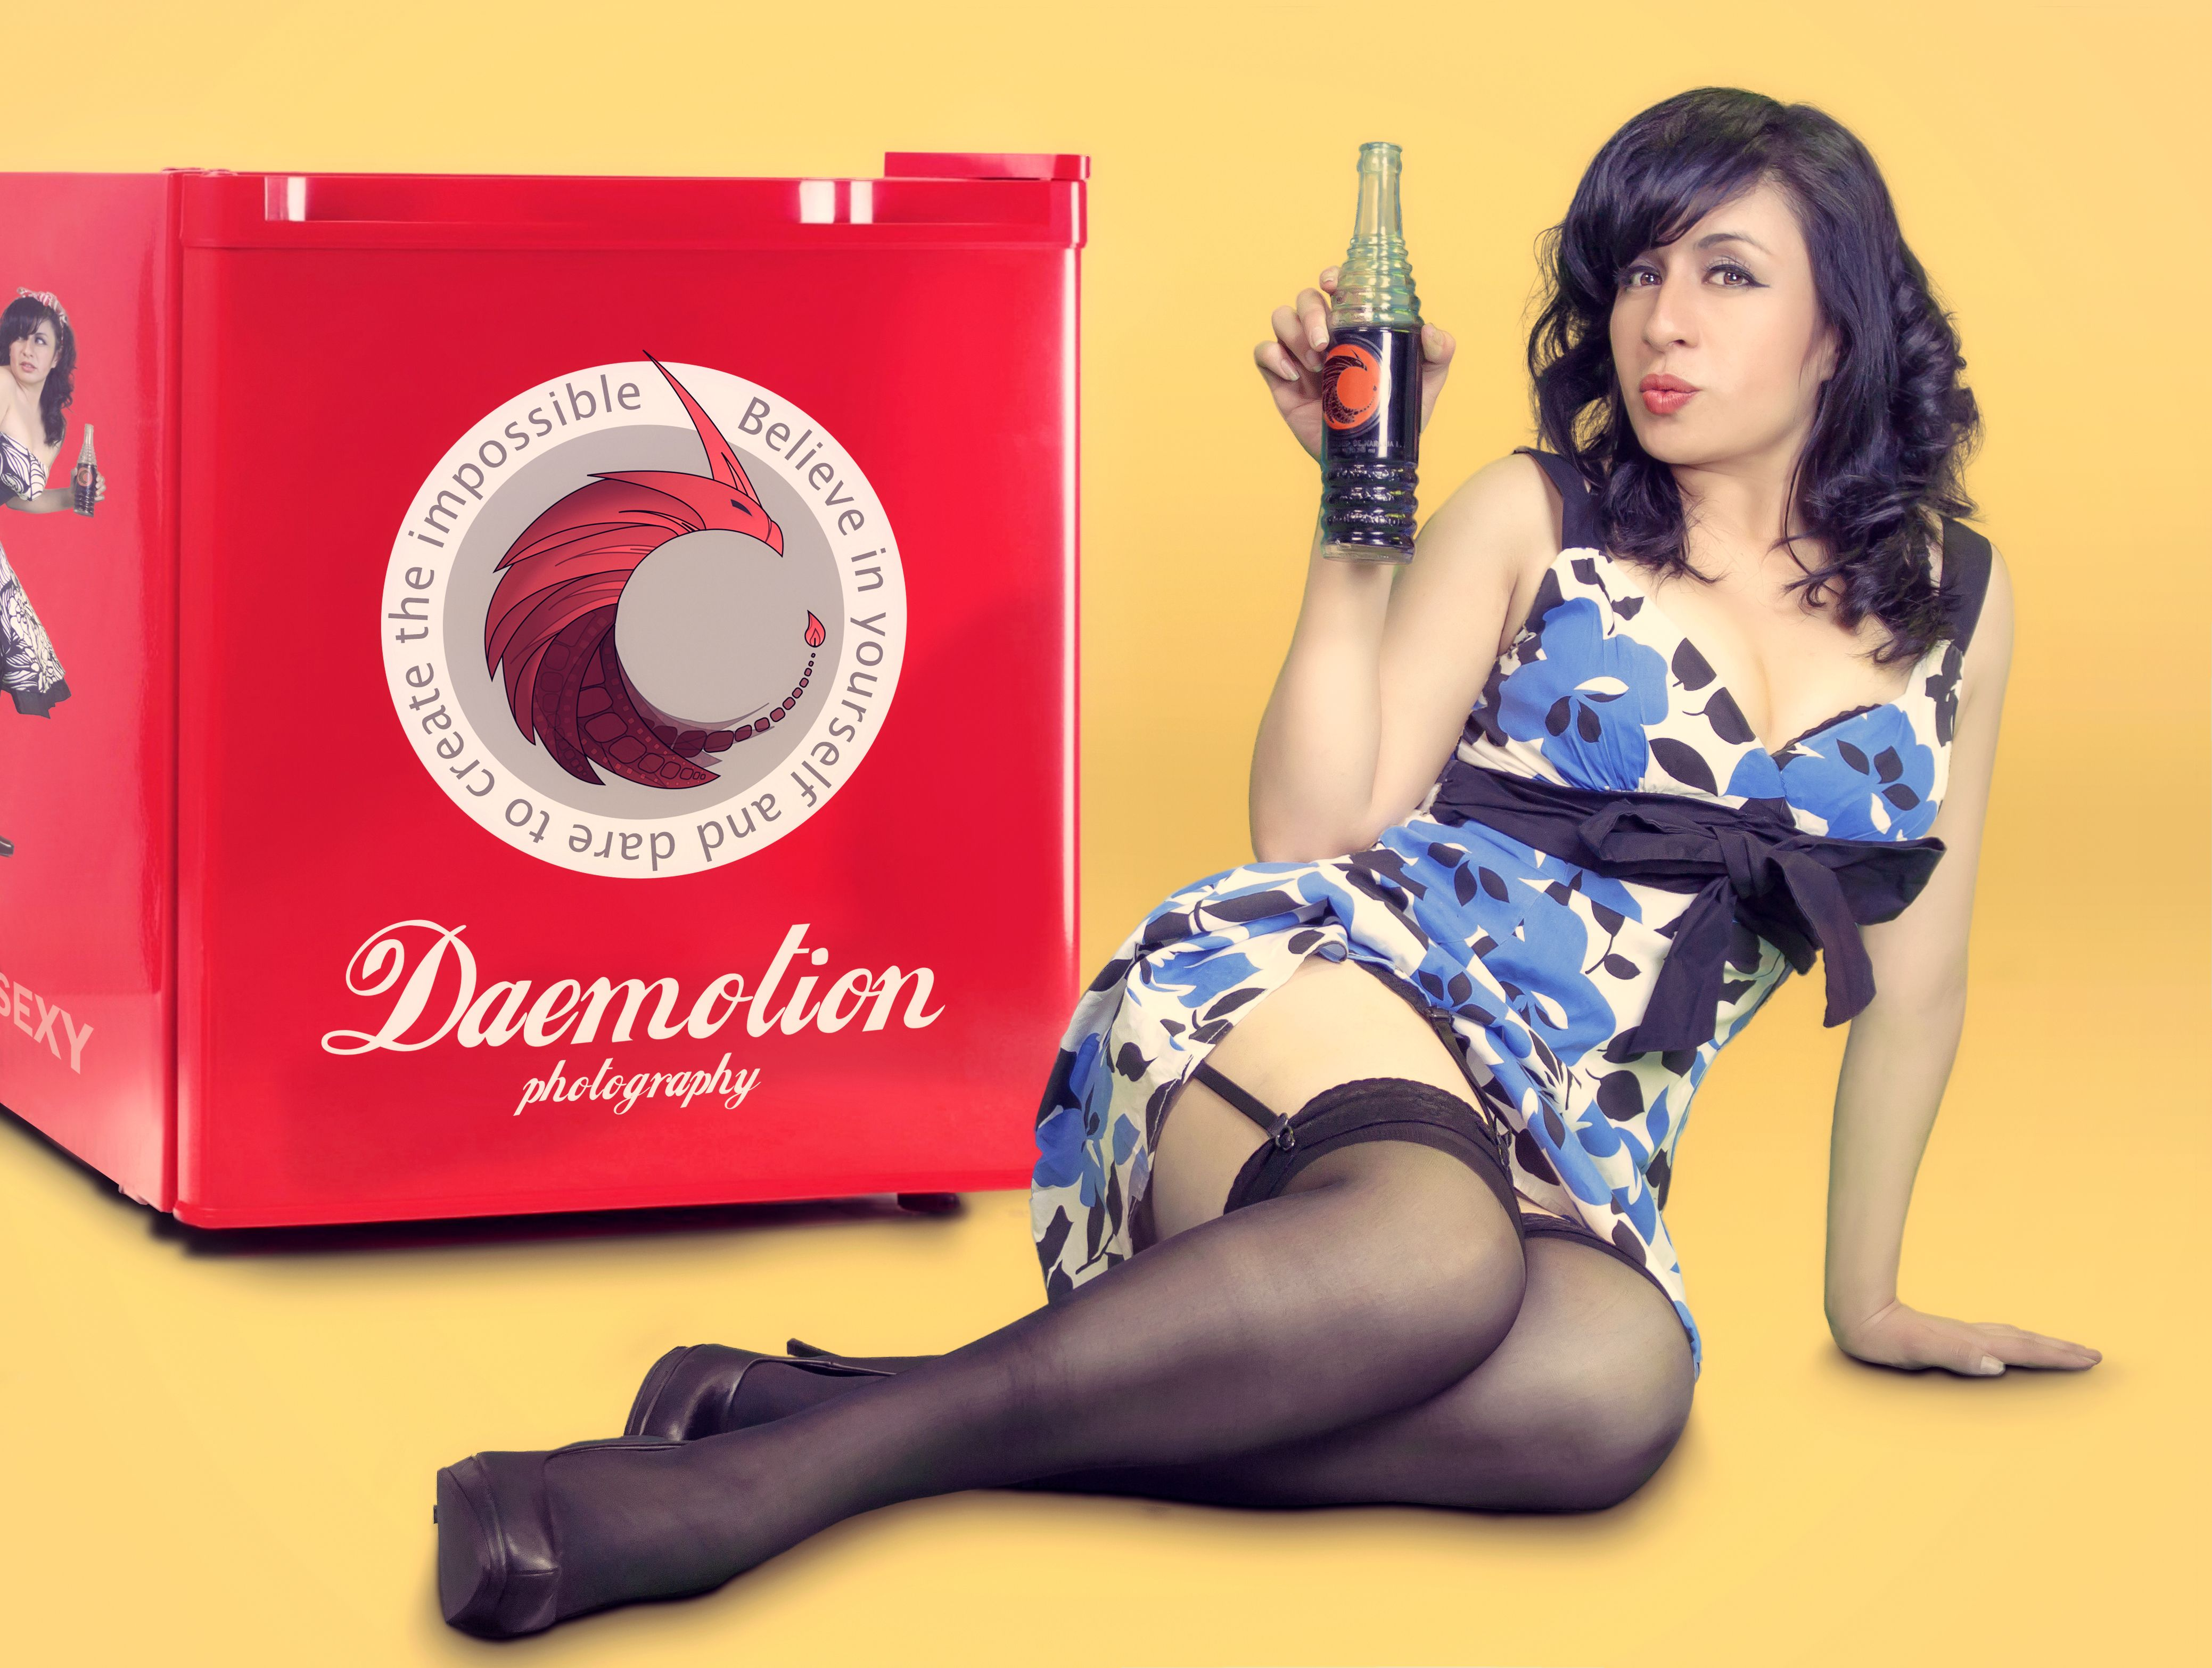 Producer: Daemotion photography Photographer: Dorian Dae Art Designer: Sol Hurt Model: Janett Aguiñaga Staff: Juli Mata 2013